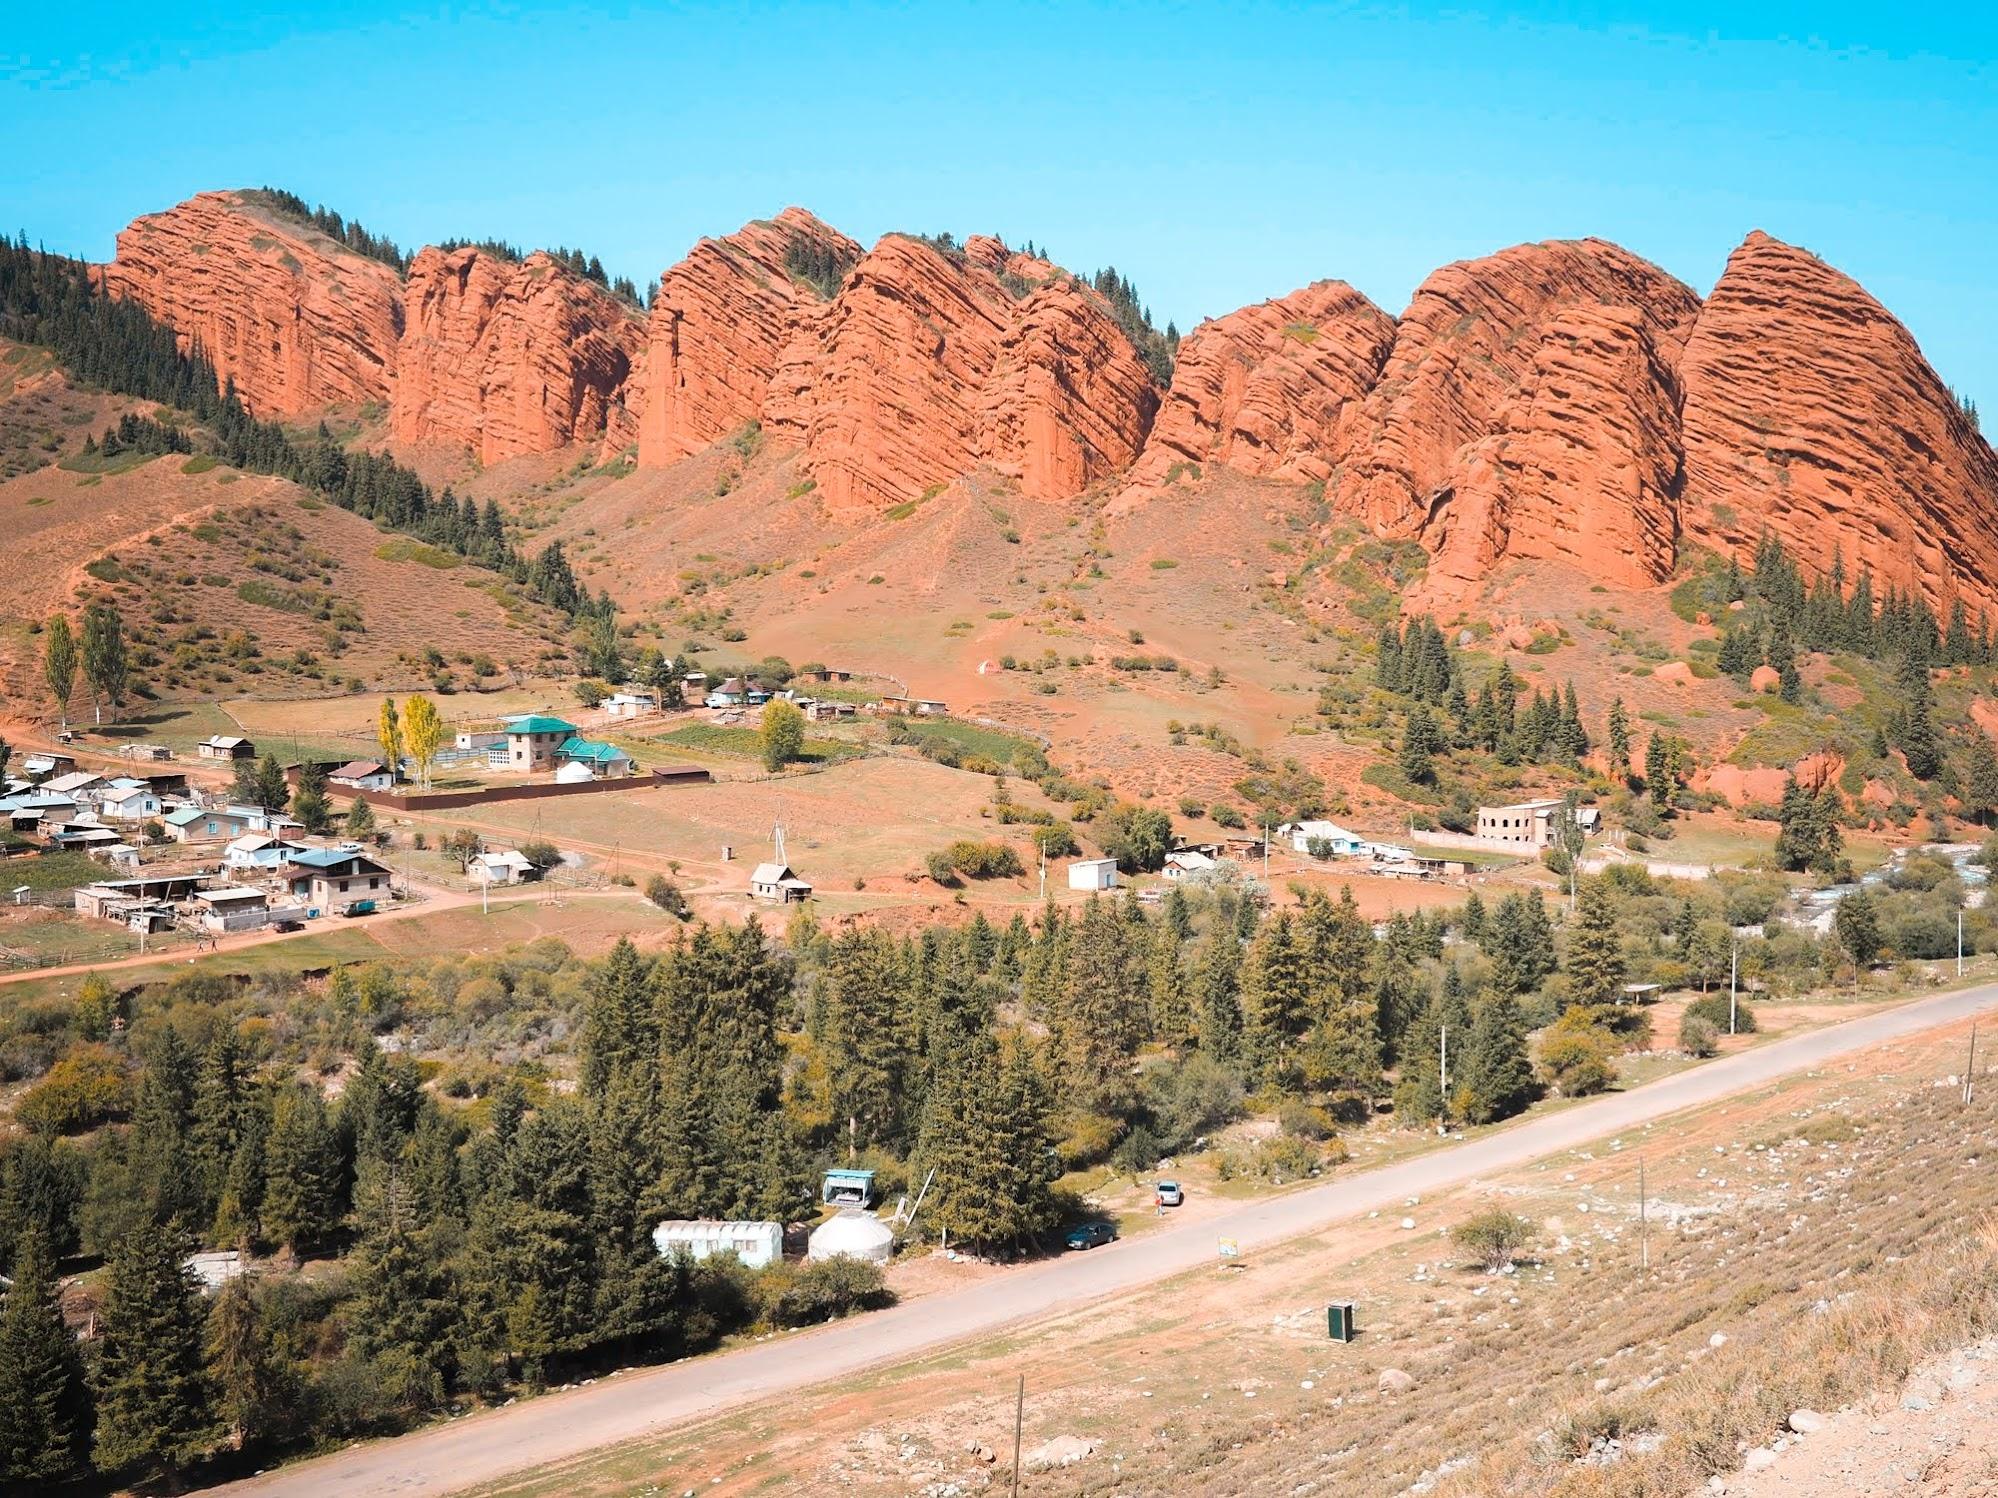 Jety Orguz near Karakol, Kyrgyzstan